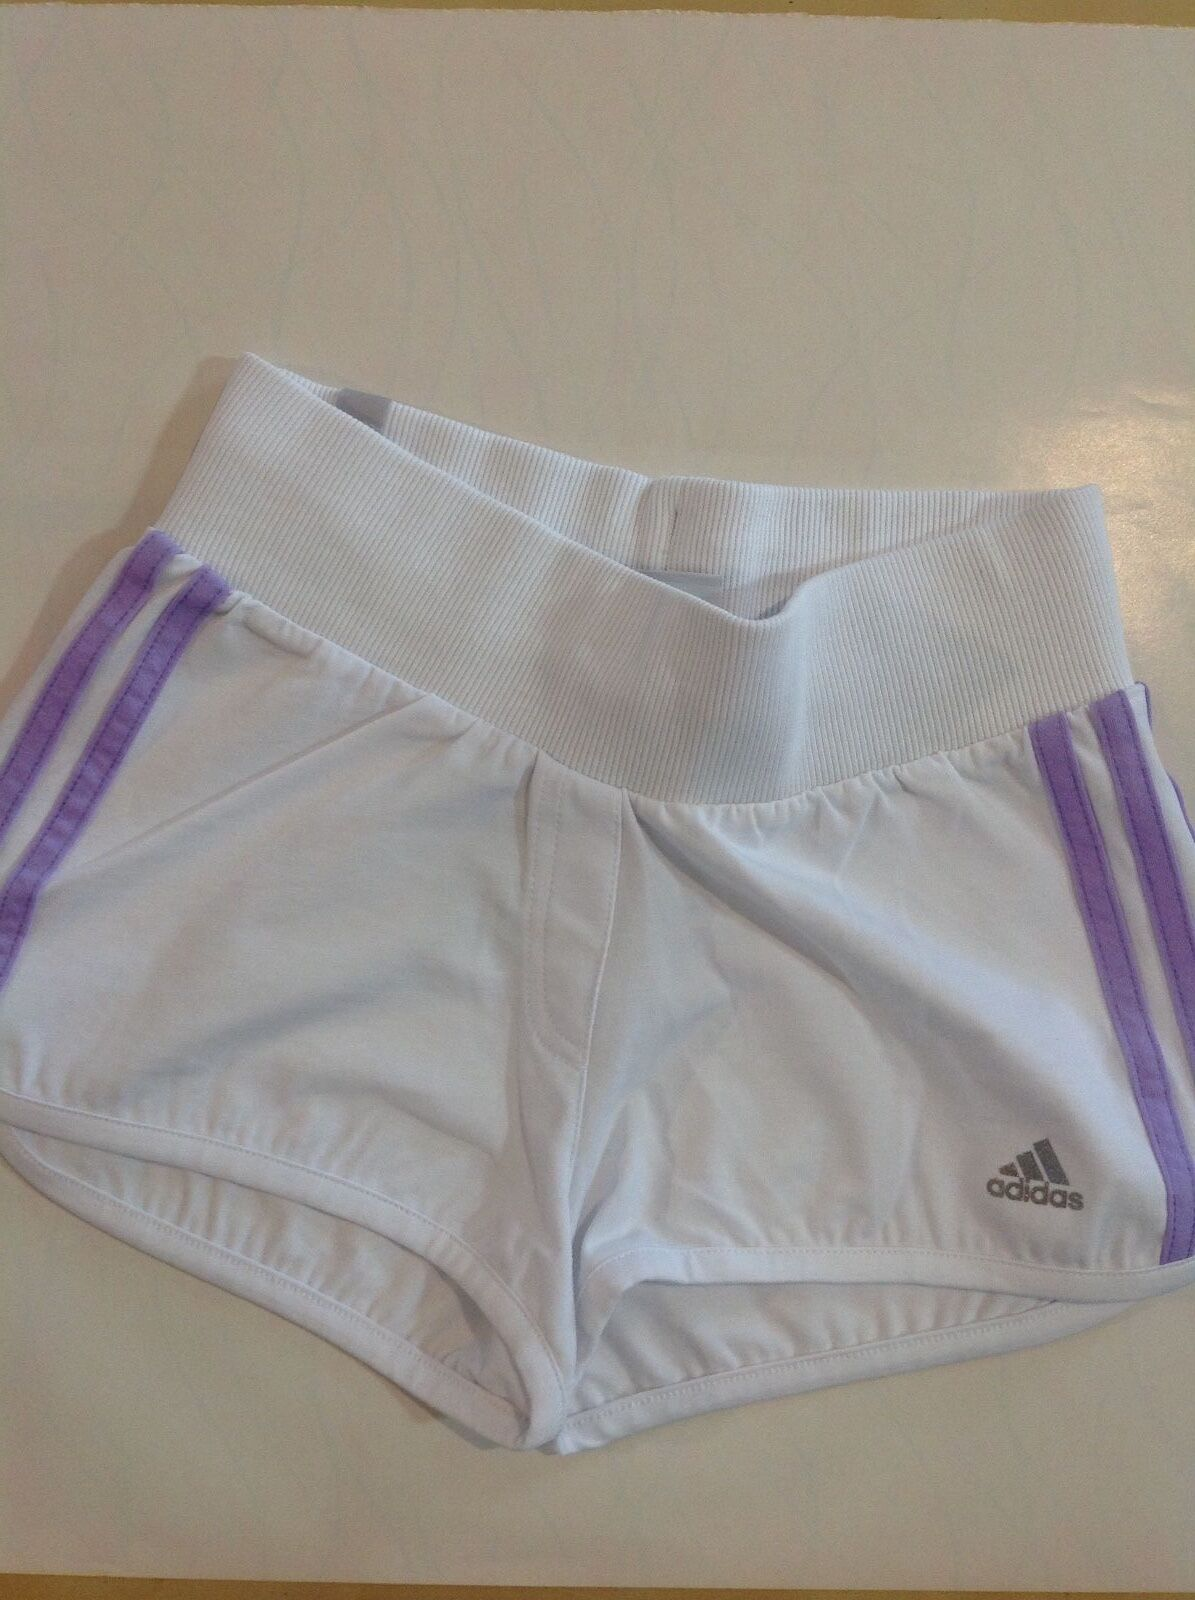 Abbigliamento sportivo donna ADIDAS Pantaloncino corto Short Bianco art.D04400